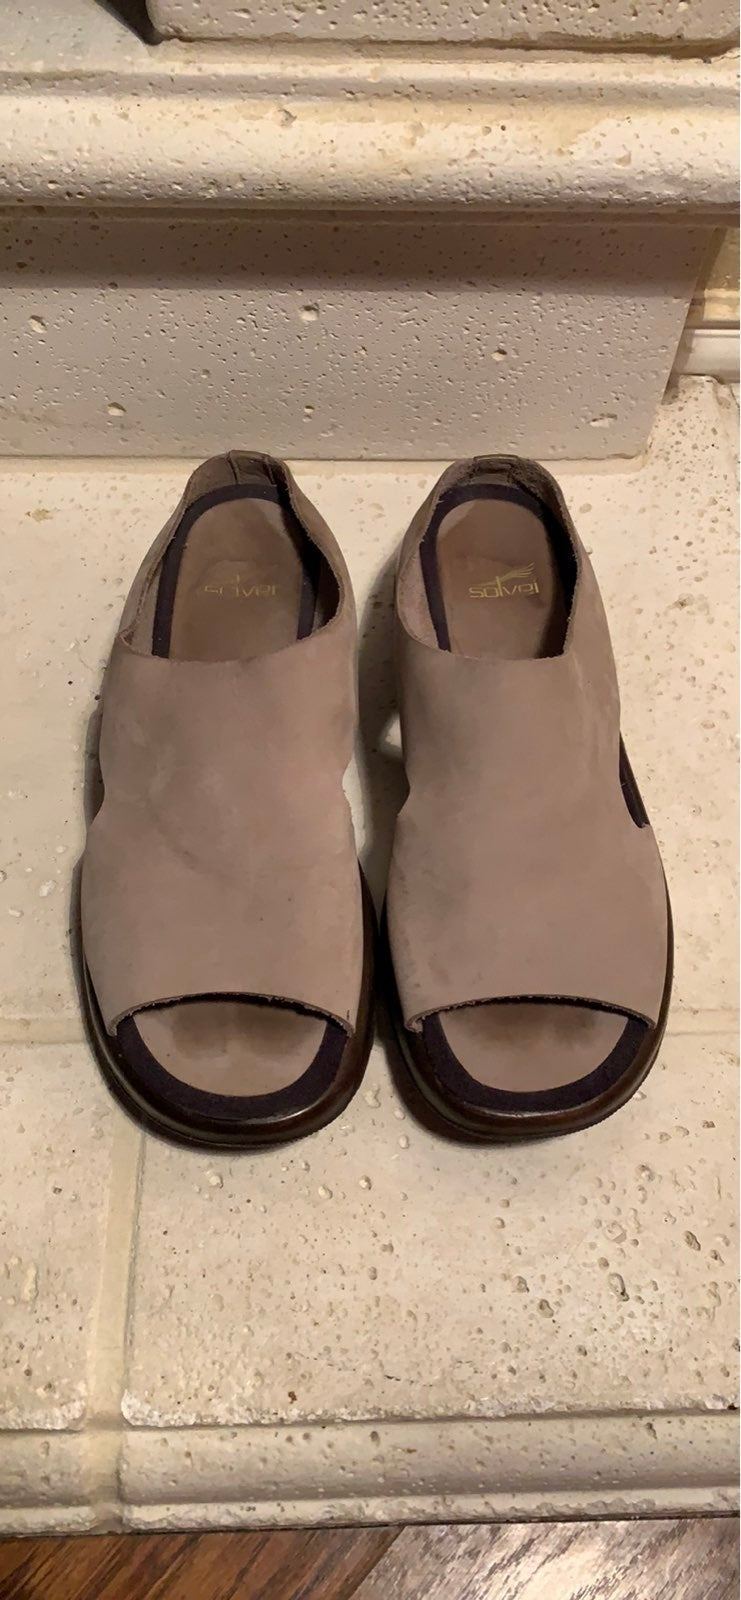 Sz 41 Dansko Grey Sandals